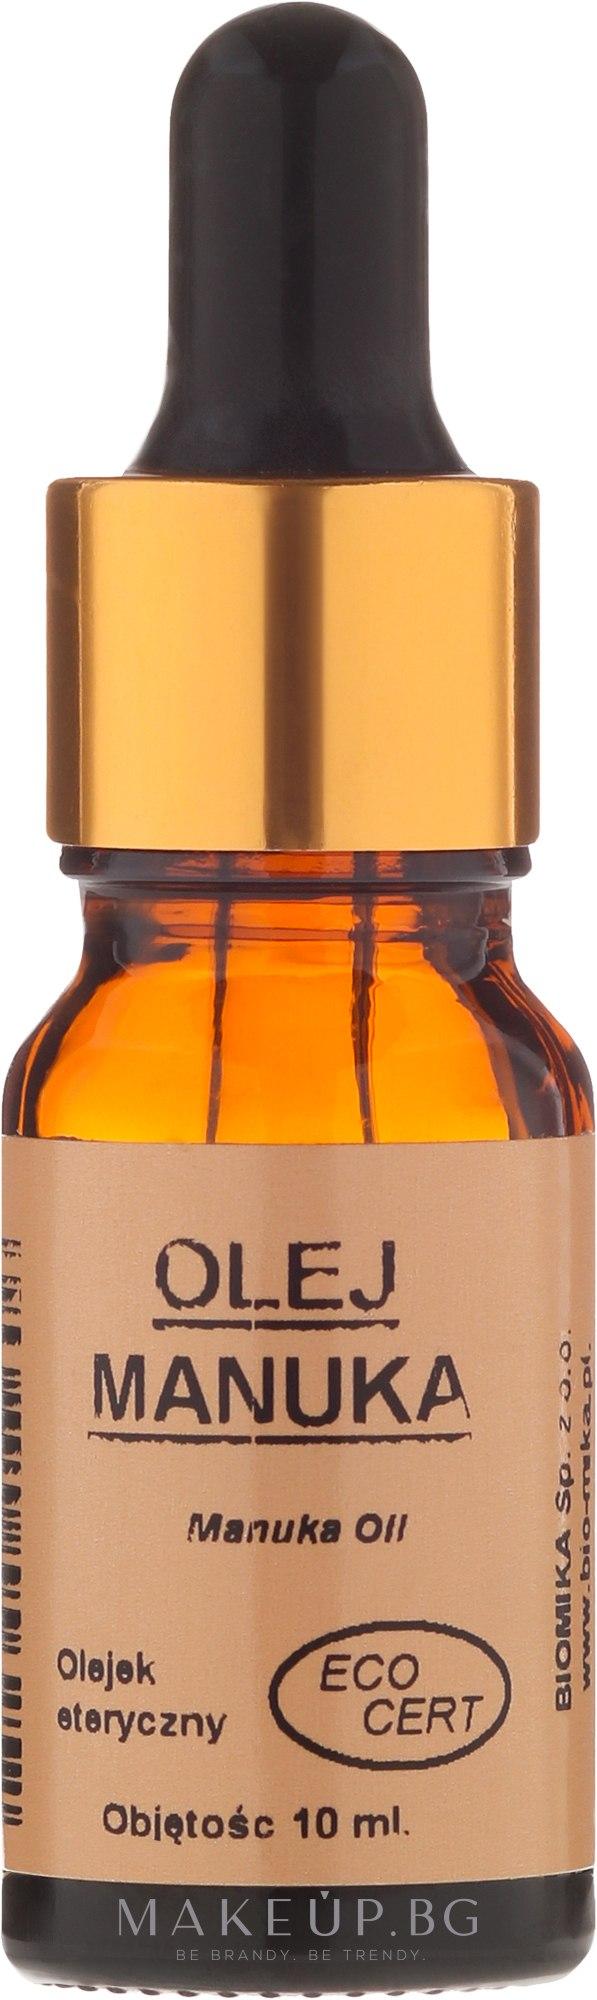 "Натурално масло ""Манука"" - Biomika Oil Manuka — снимка 10 ml"